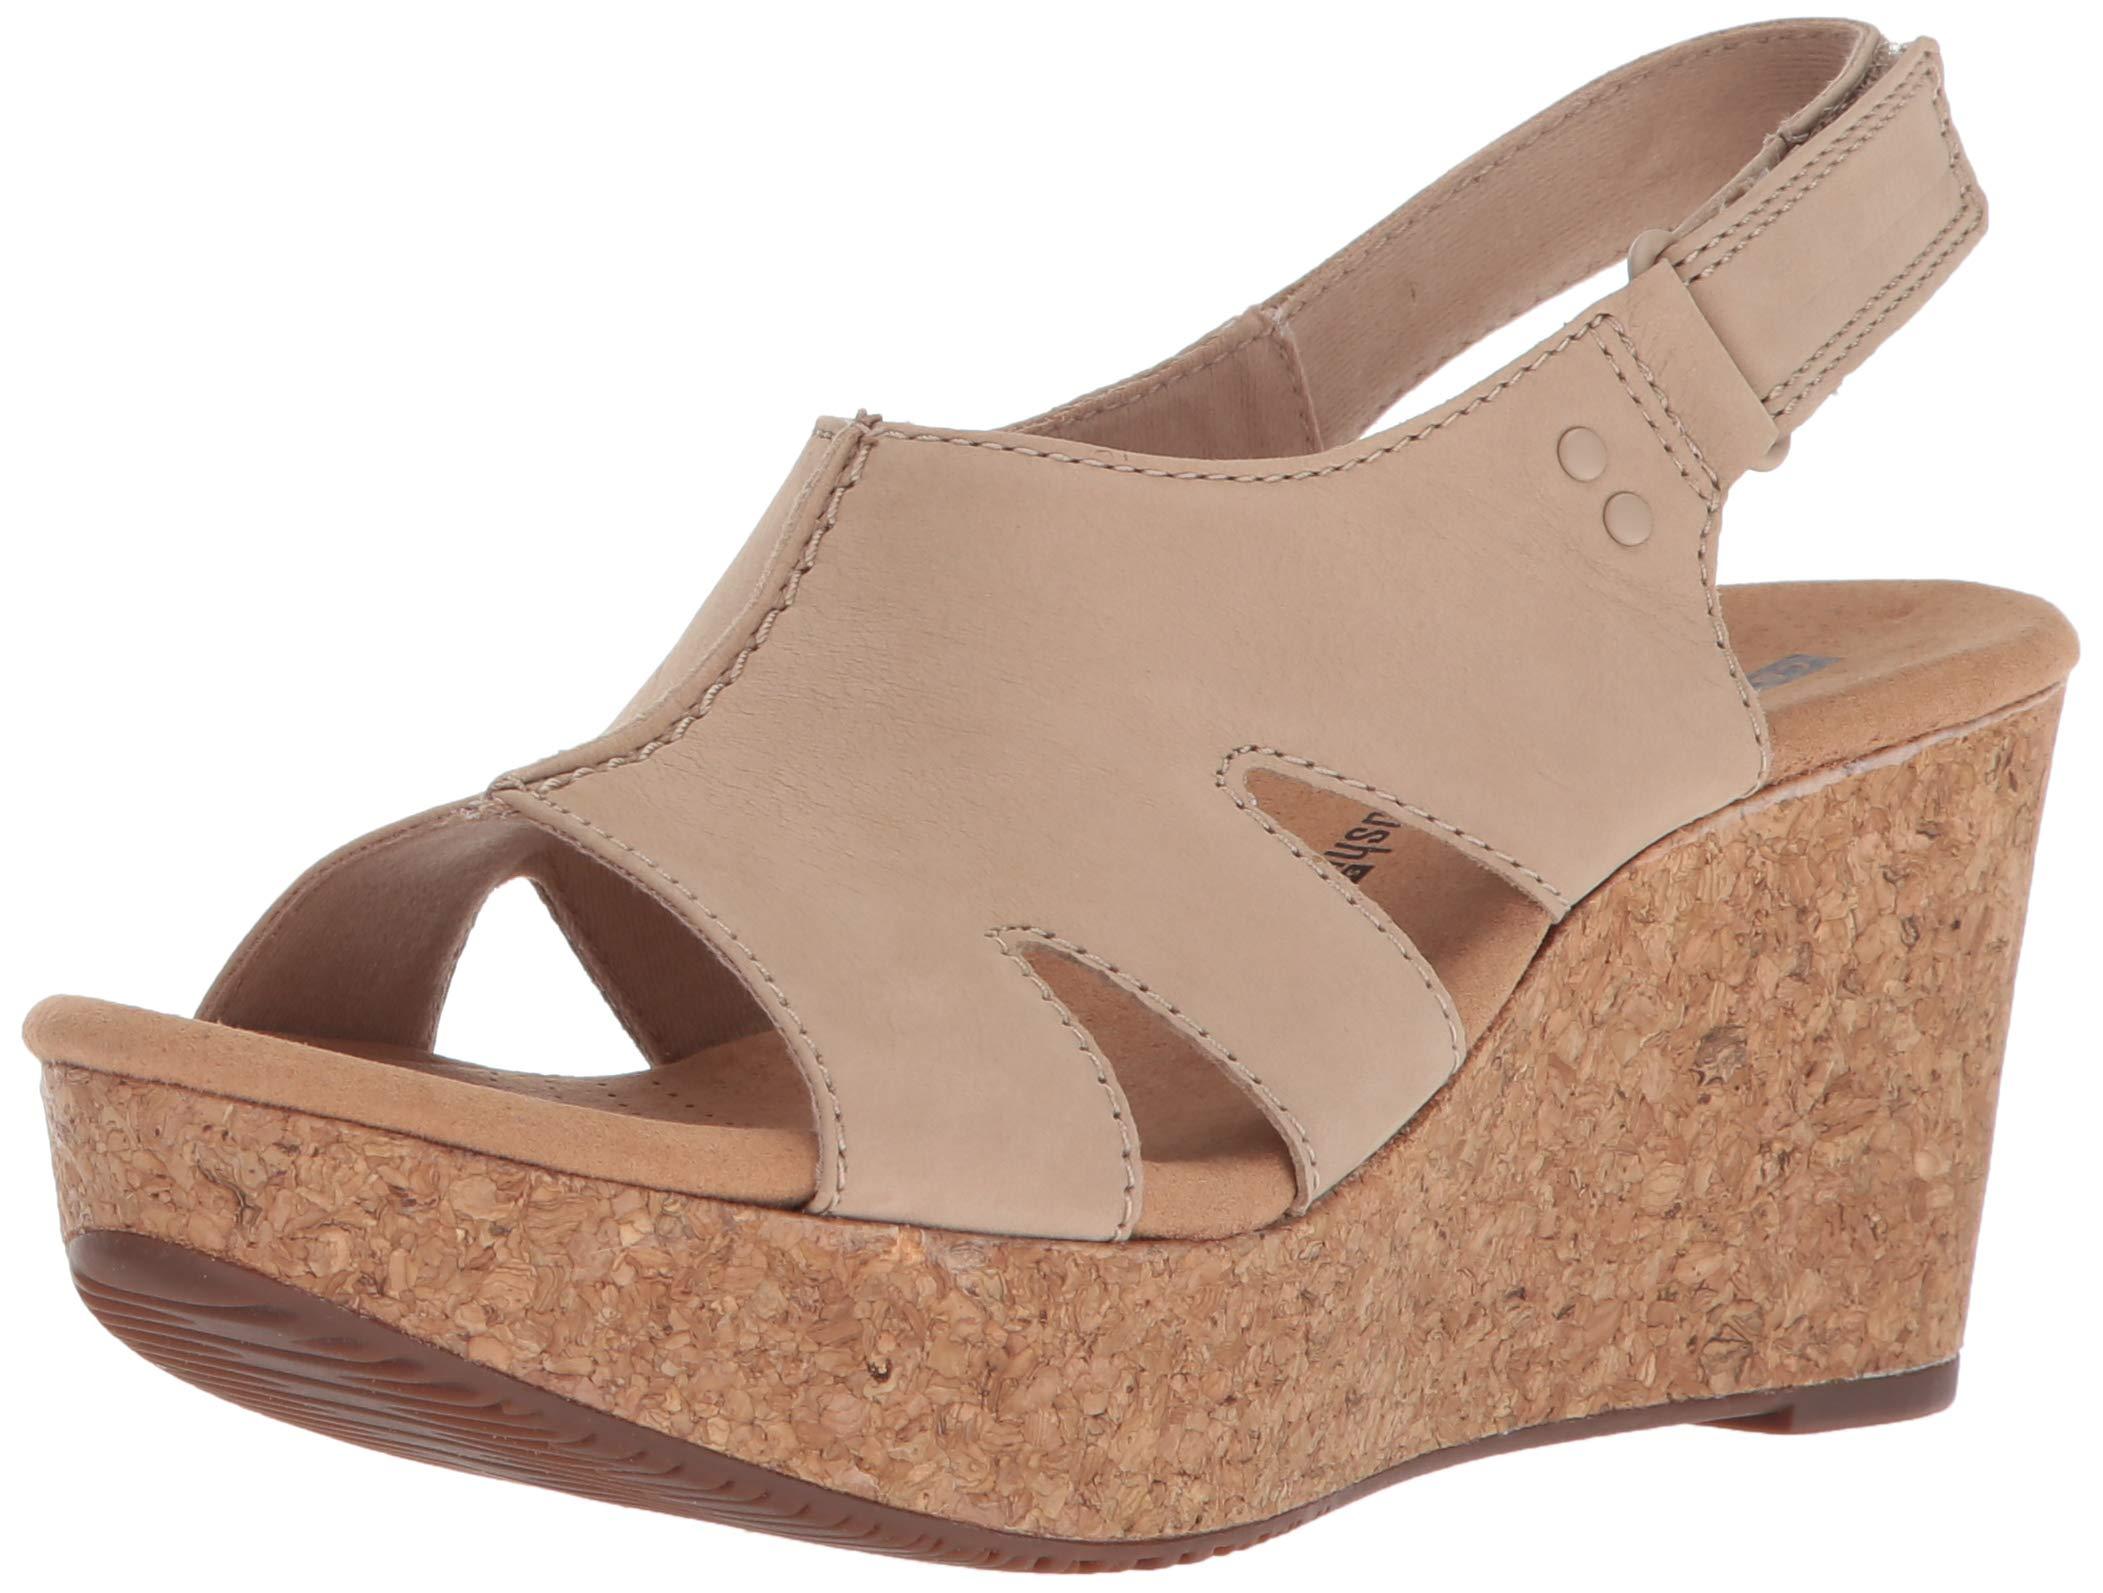 8020c51a05 Best Rated in Women's Platform & Wedge Sandals & Helpful Customer ...